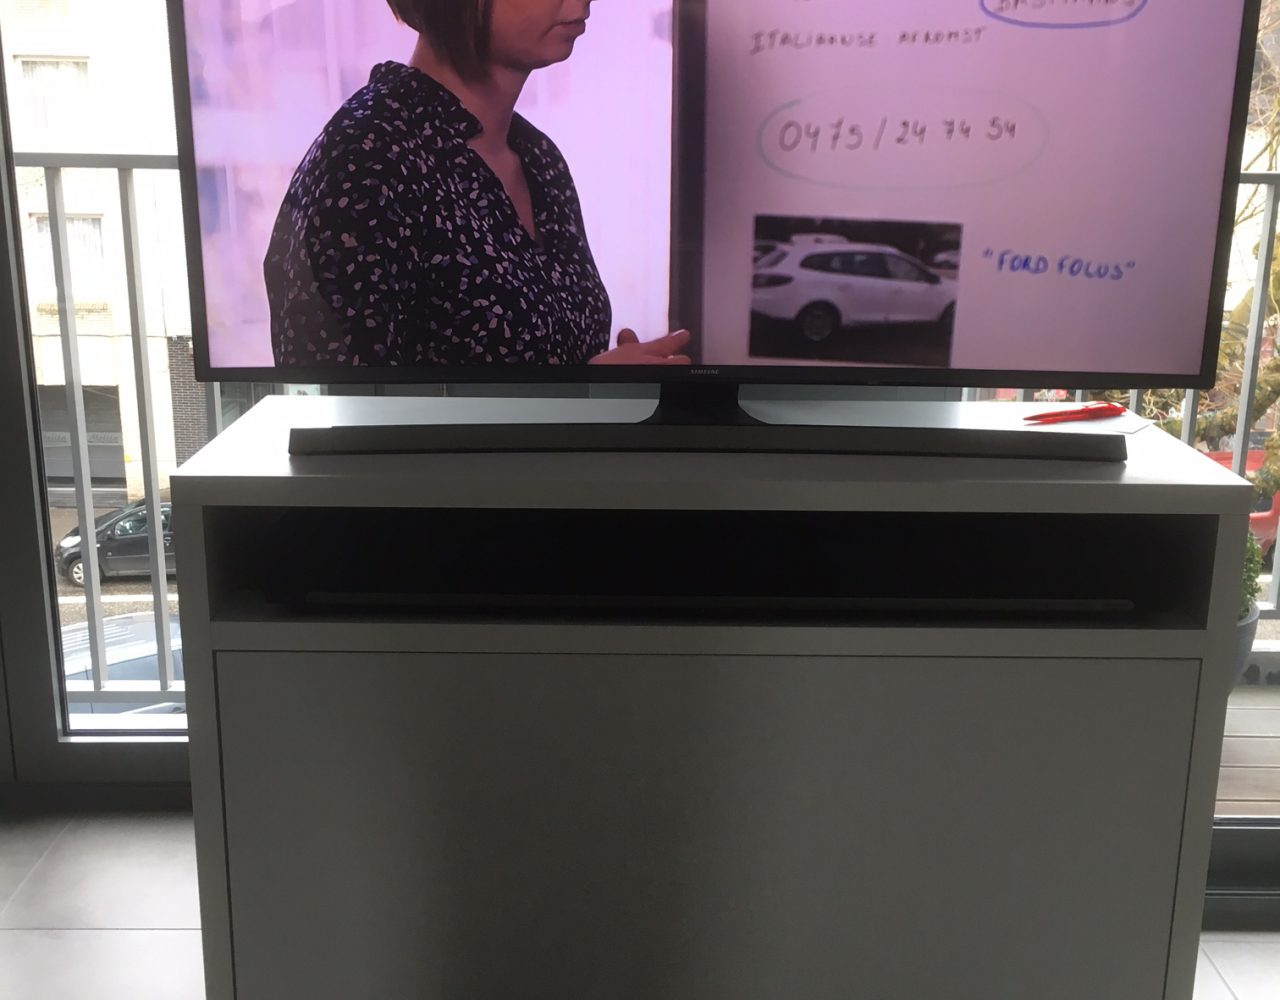 Maatmeubel Met Sonos Playbar En Samsung Suhd Concepts Zottegem